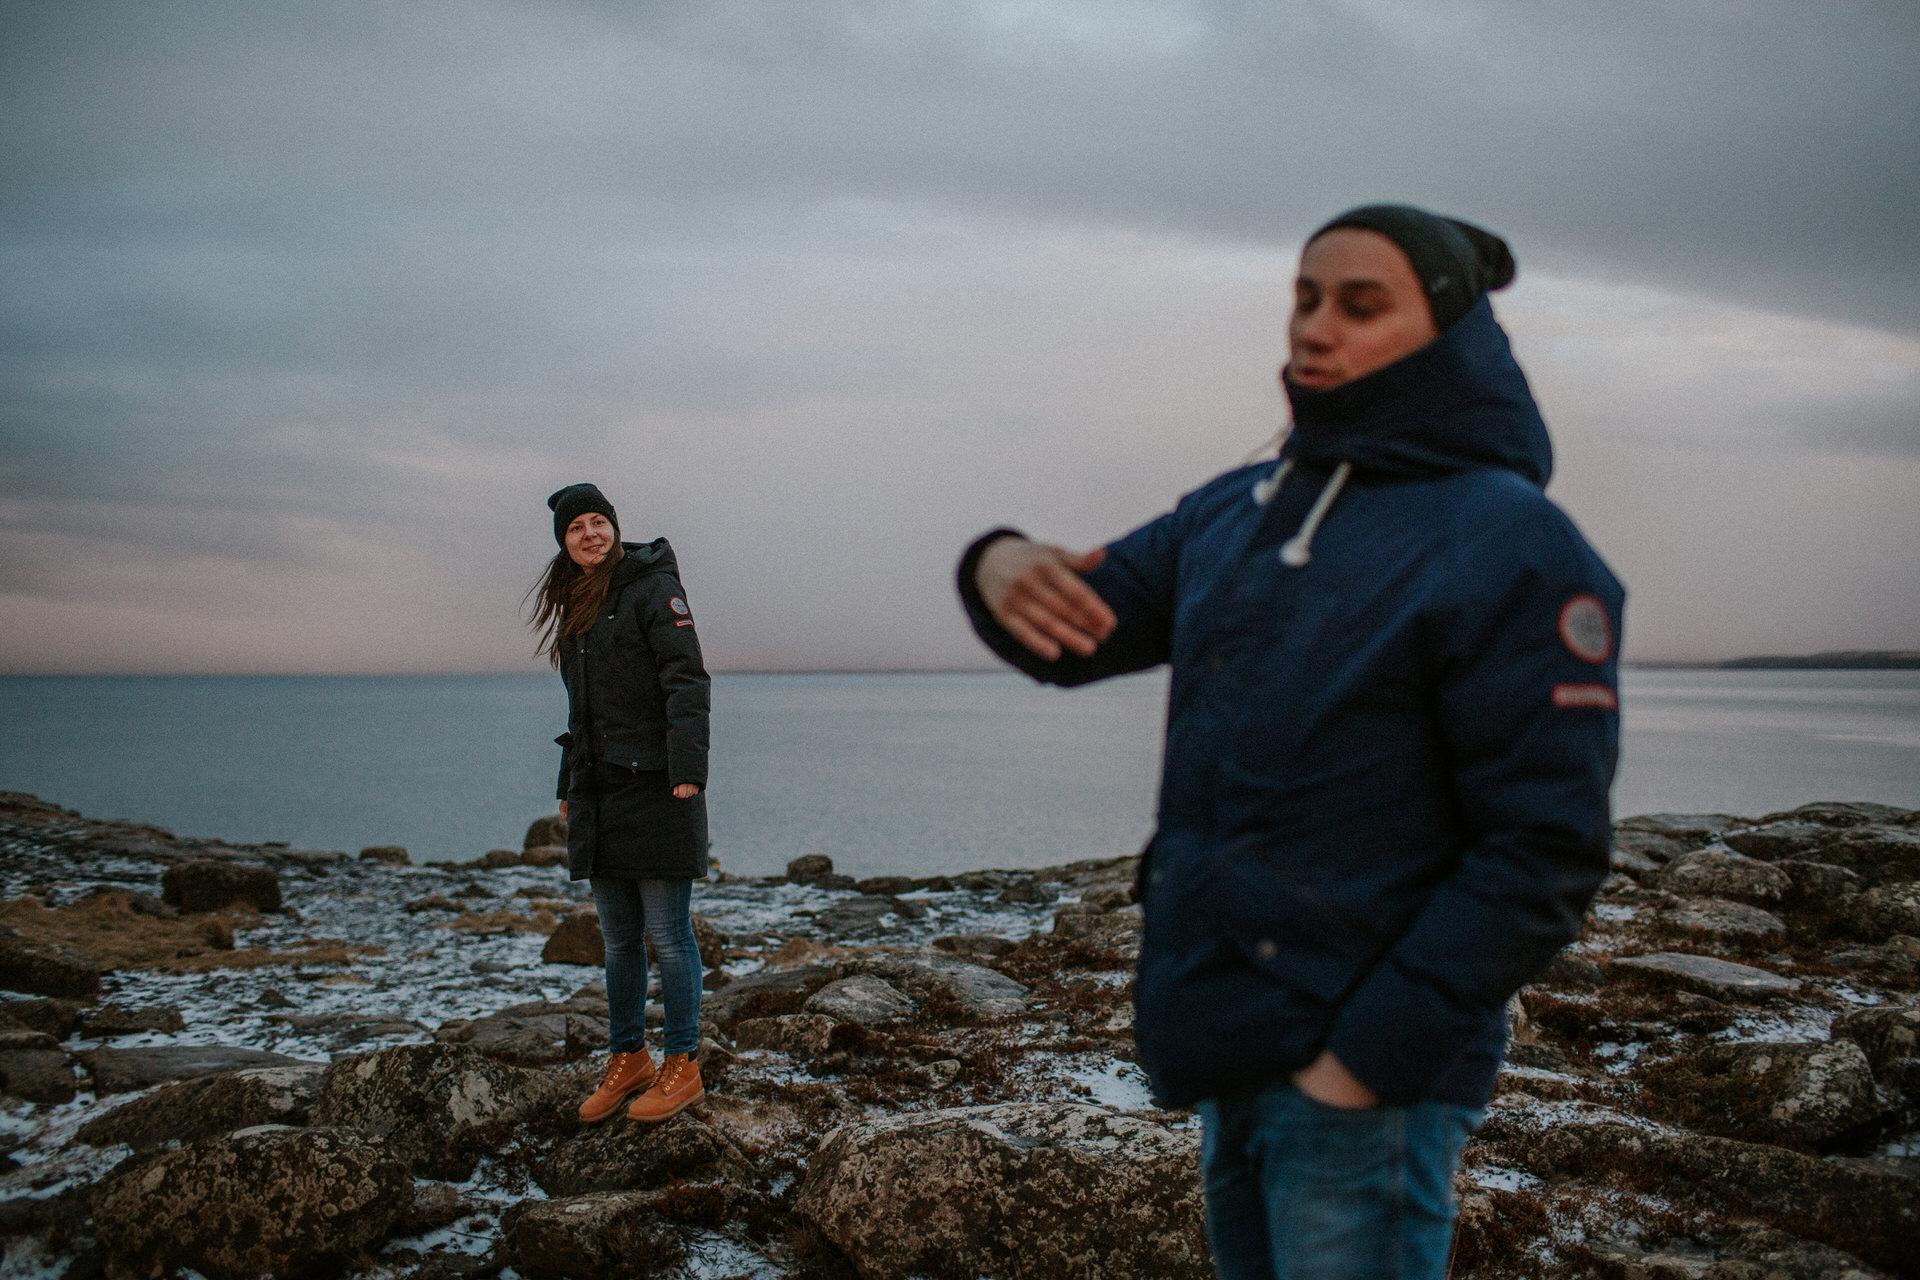 iceland photography engagement sesja narzeczenska islandia - 118.jpg